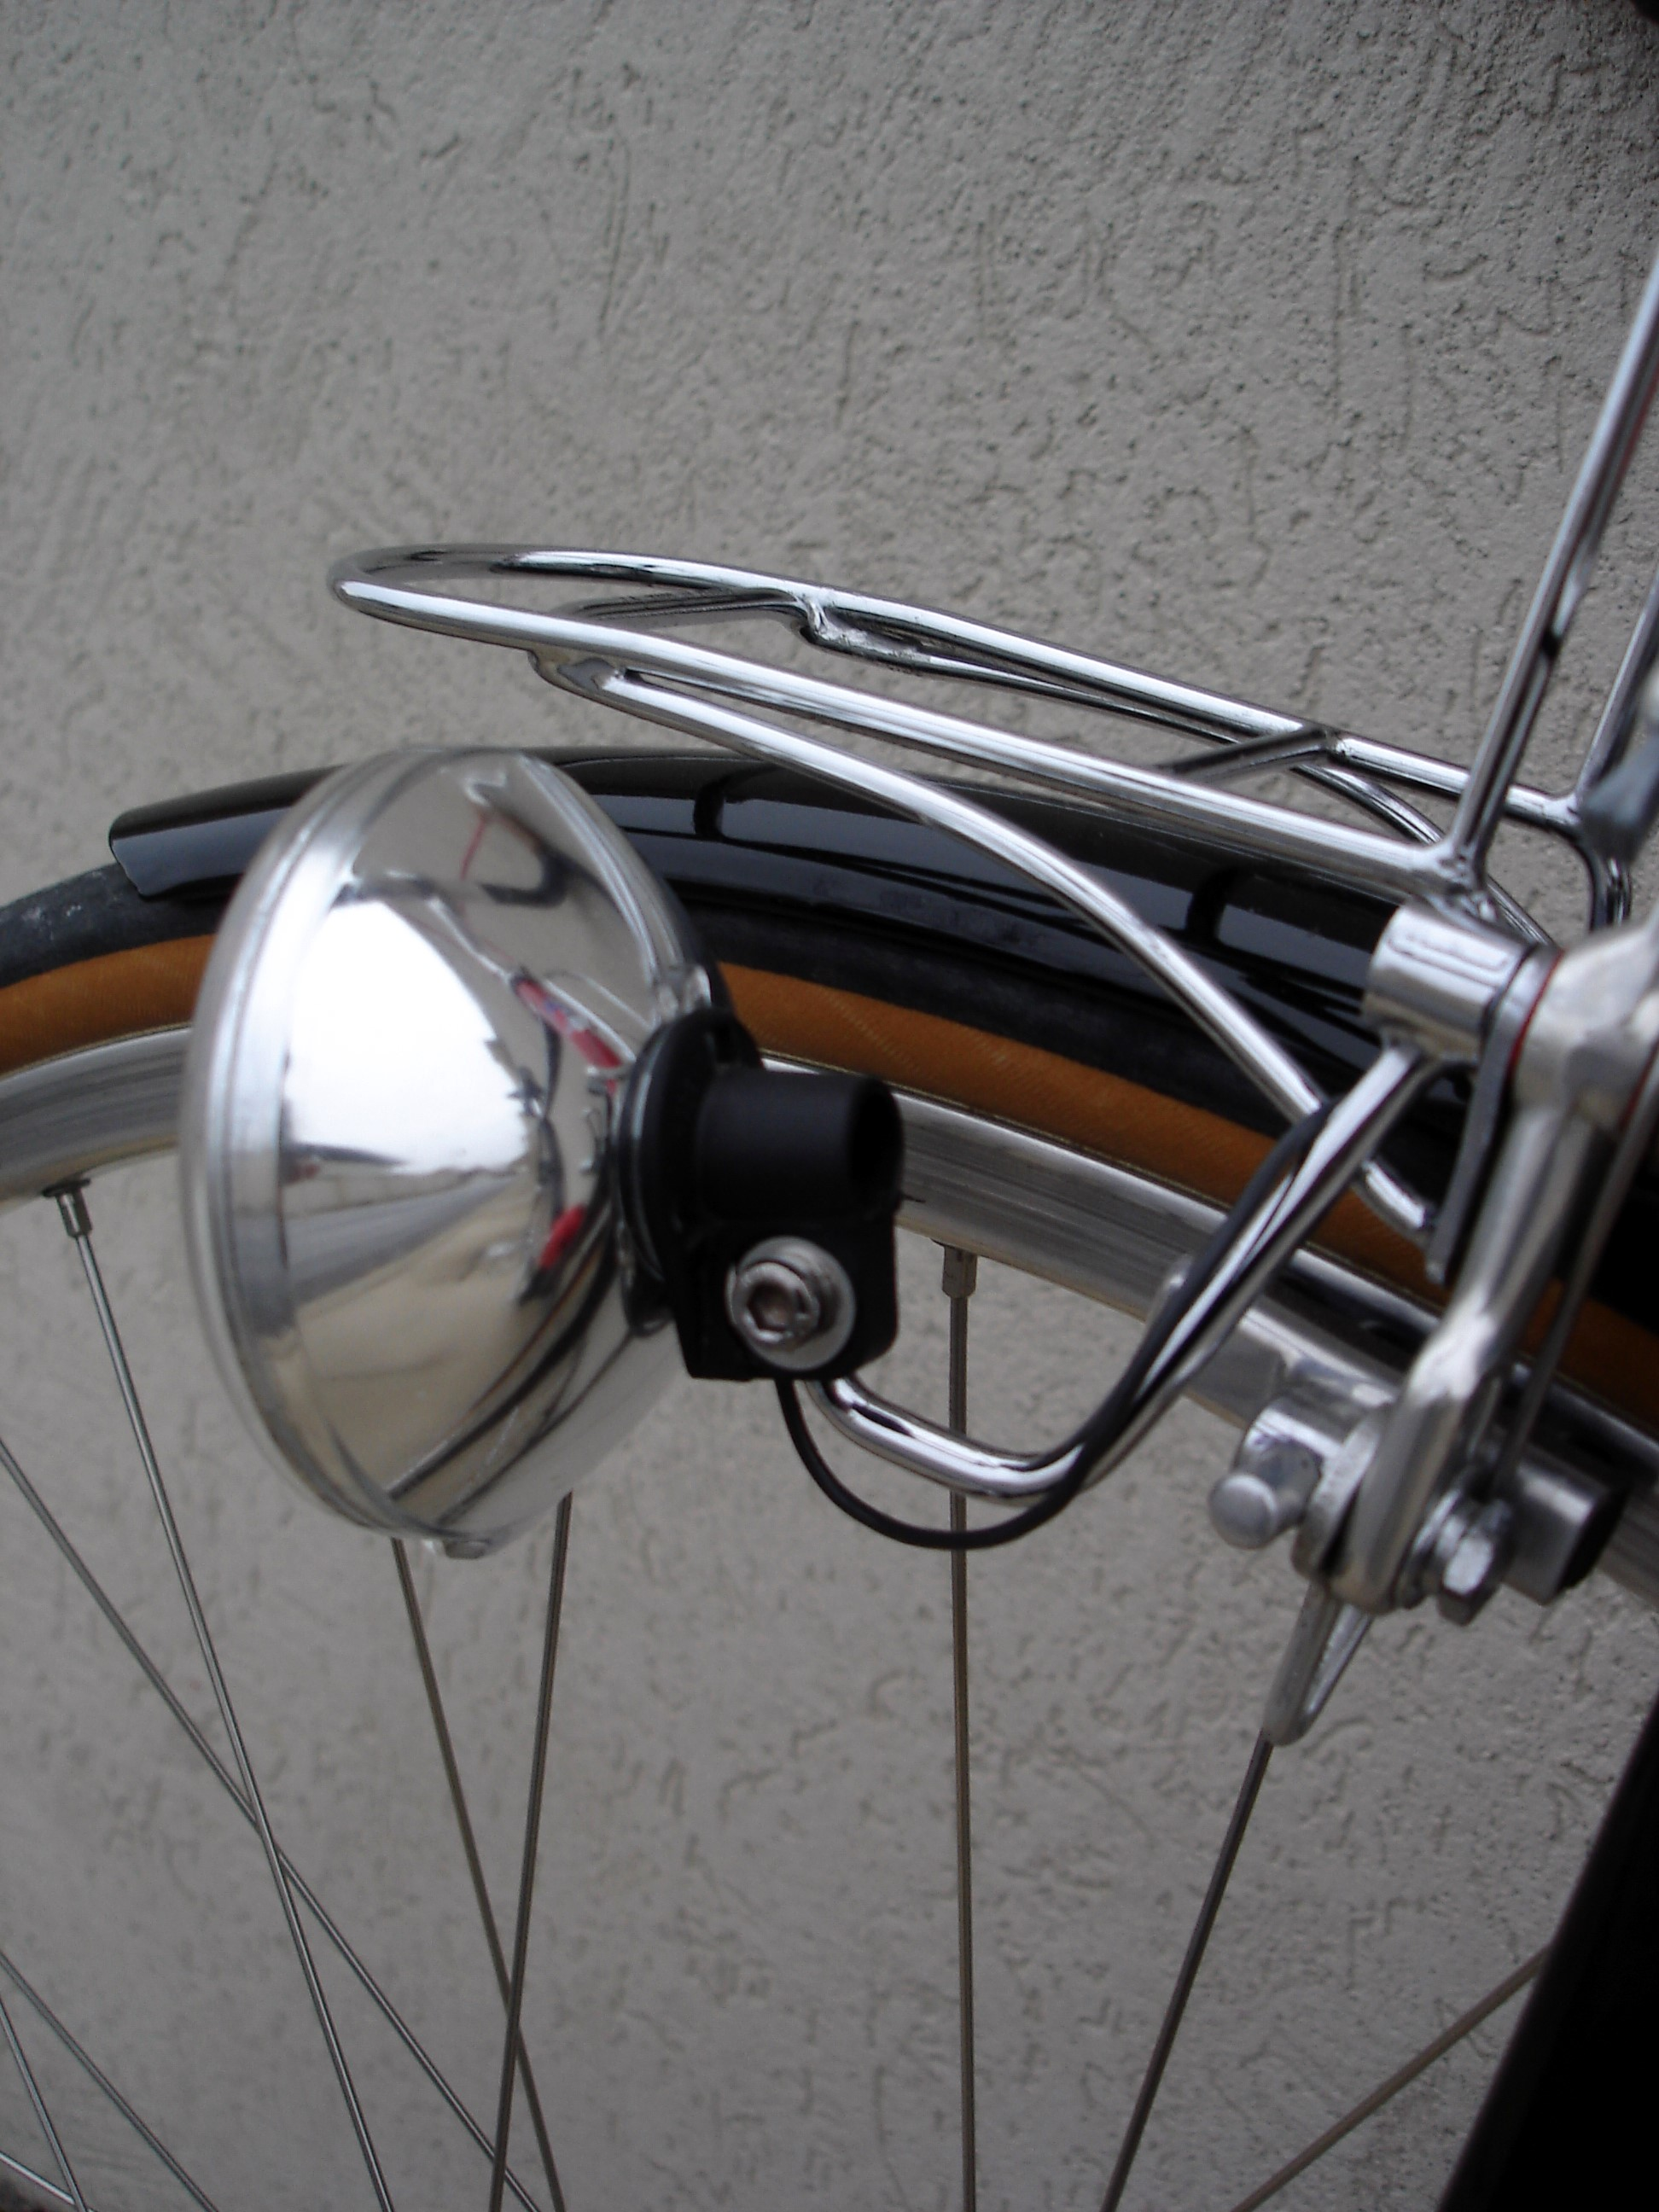 BIKE DYNAMO LIGHTING 6 VOLT 3 WATT BOTTLE GENERATOR FOR BICYCLE EITHER RIGHT//LEFT FITTING VINTAGE